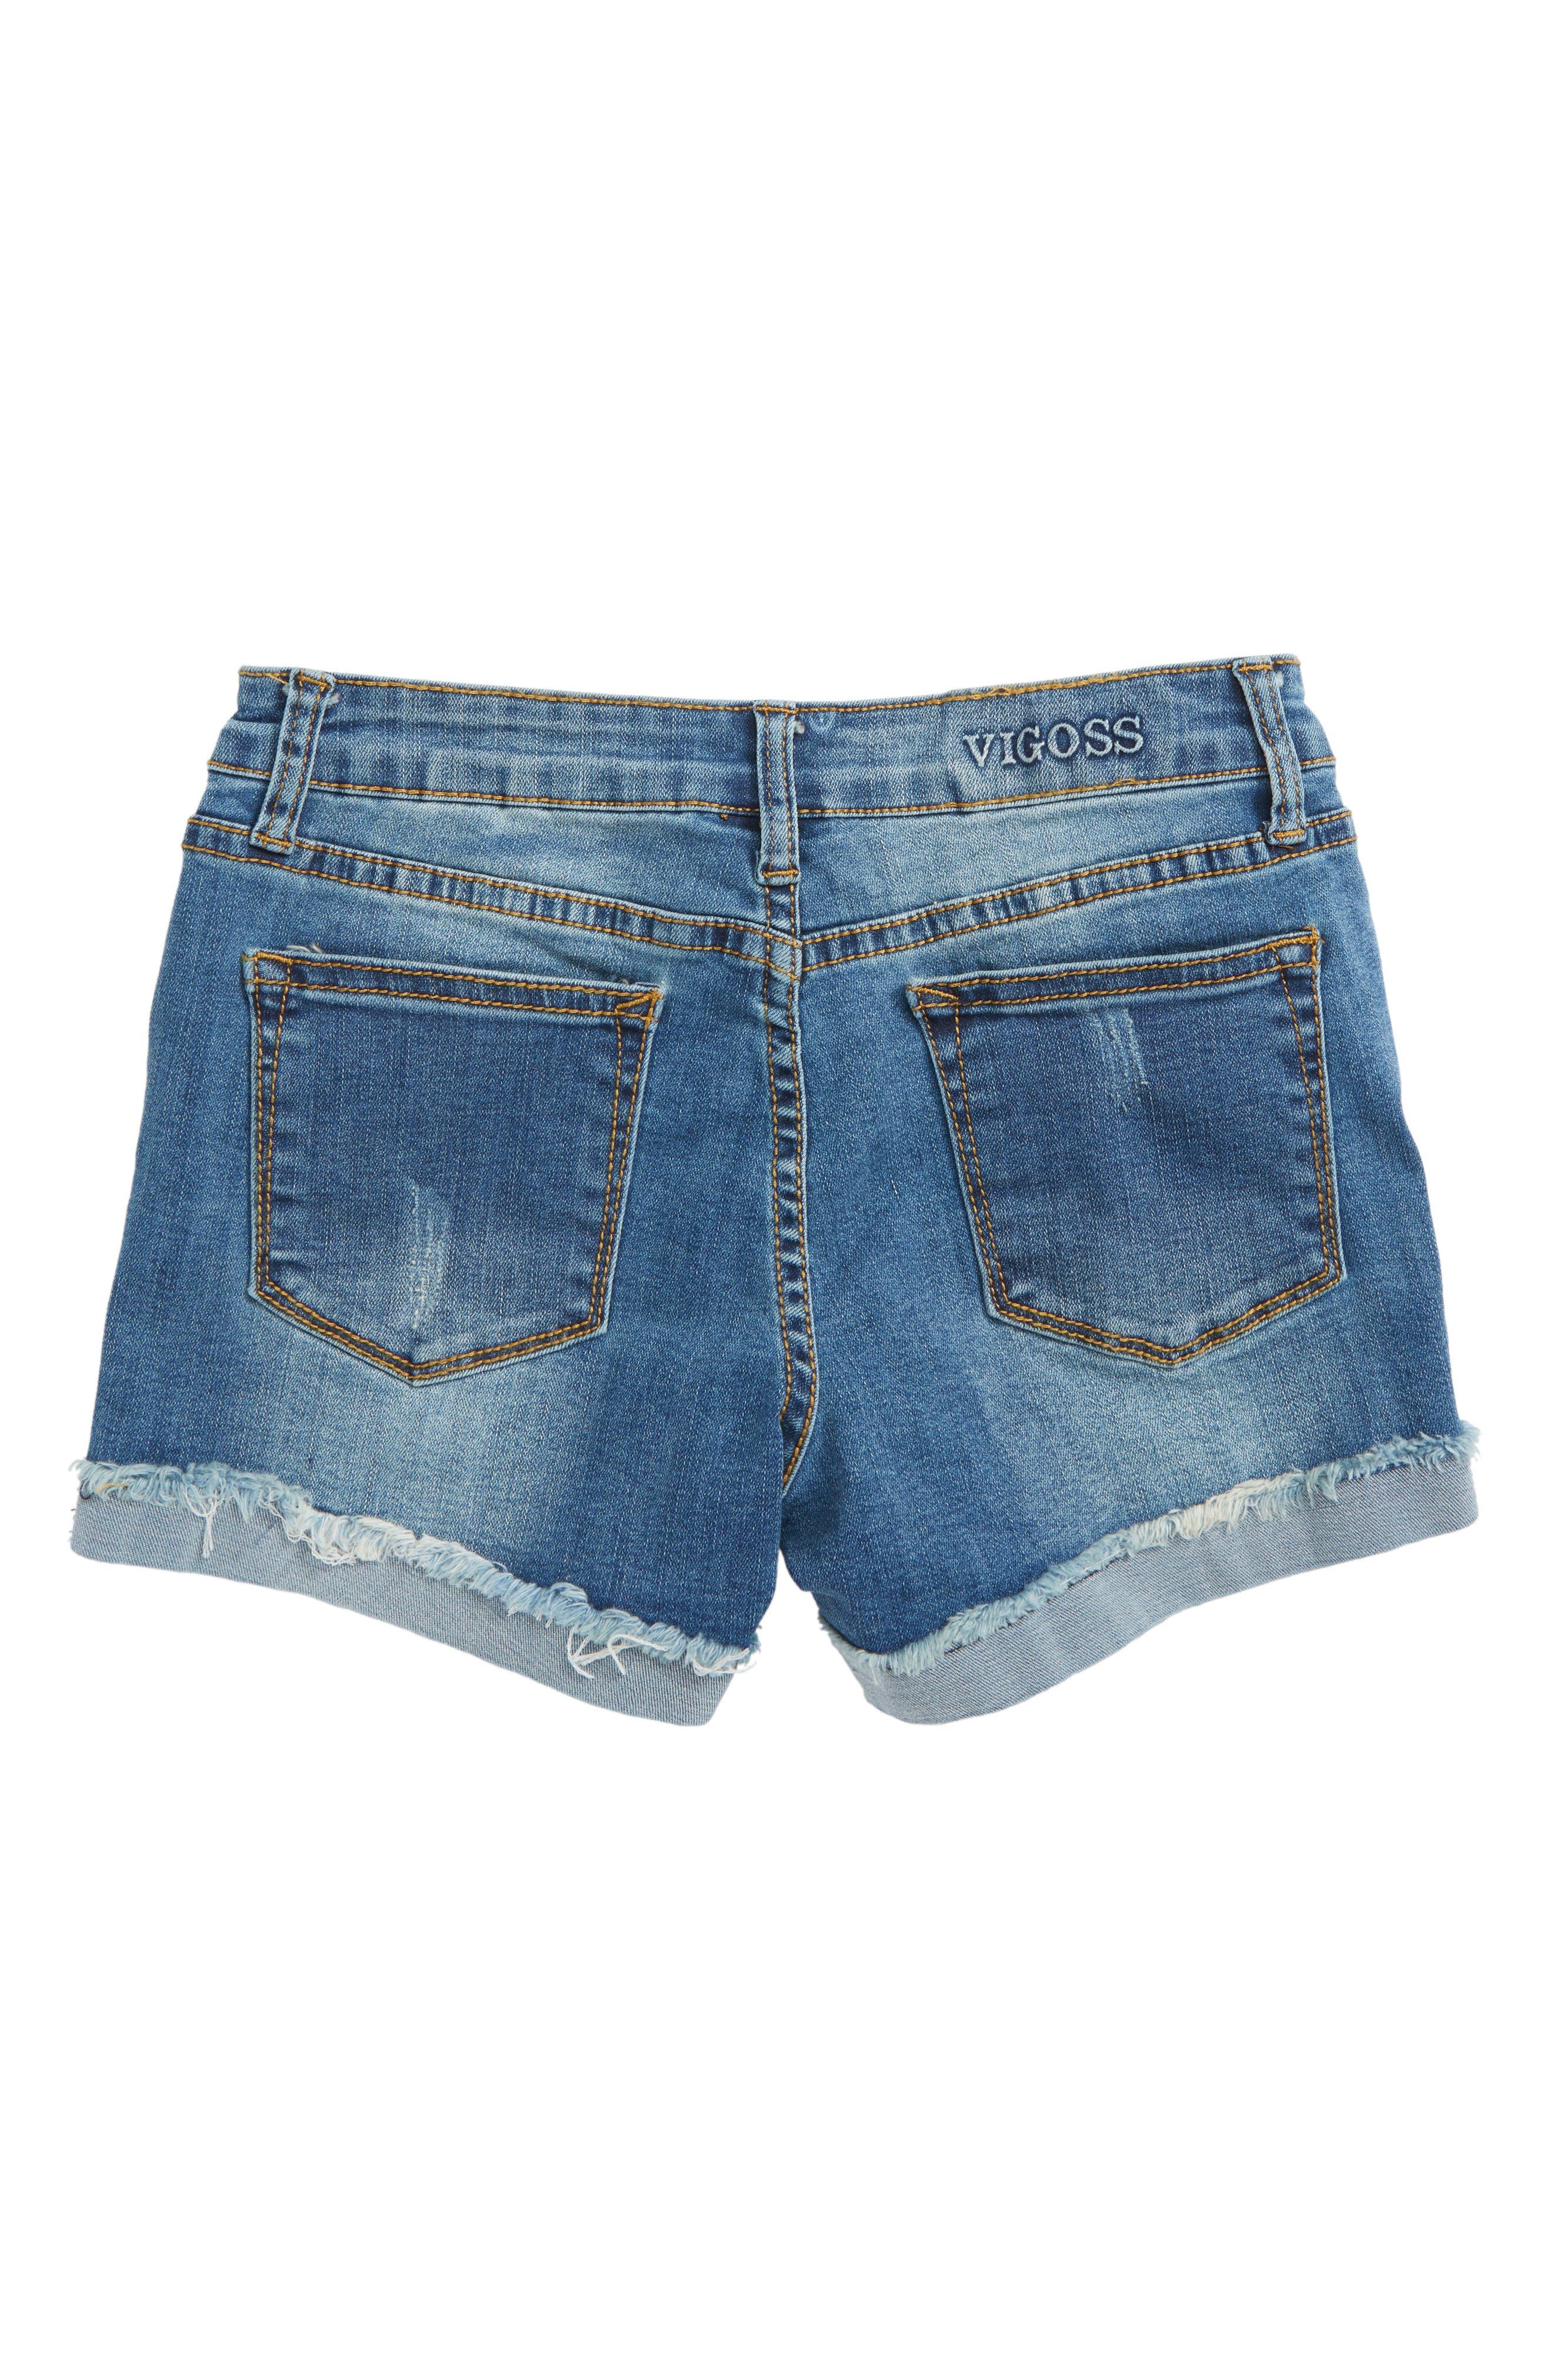 Imitation Pearl Frayed Denim Shorts,                             Alternate thumbnail 2, color,                             Regal Blue